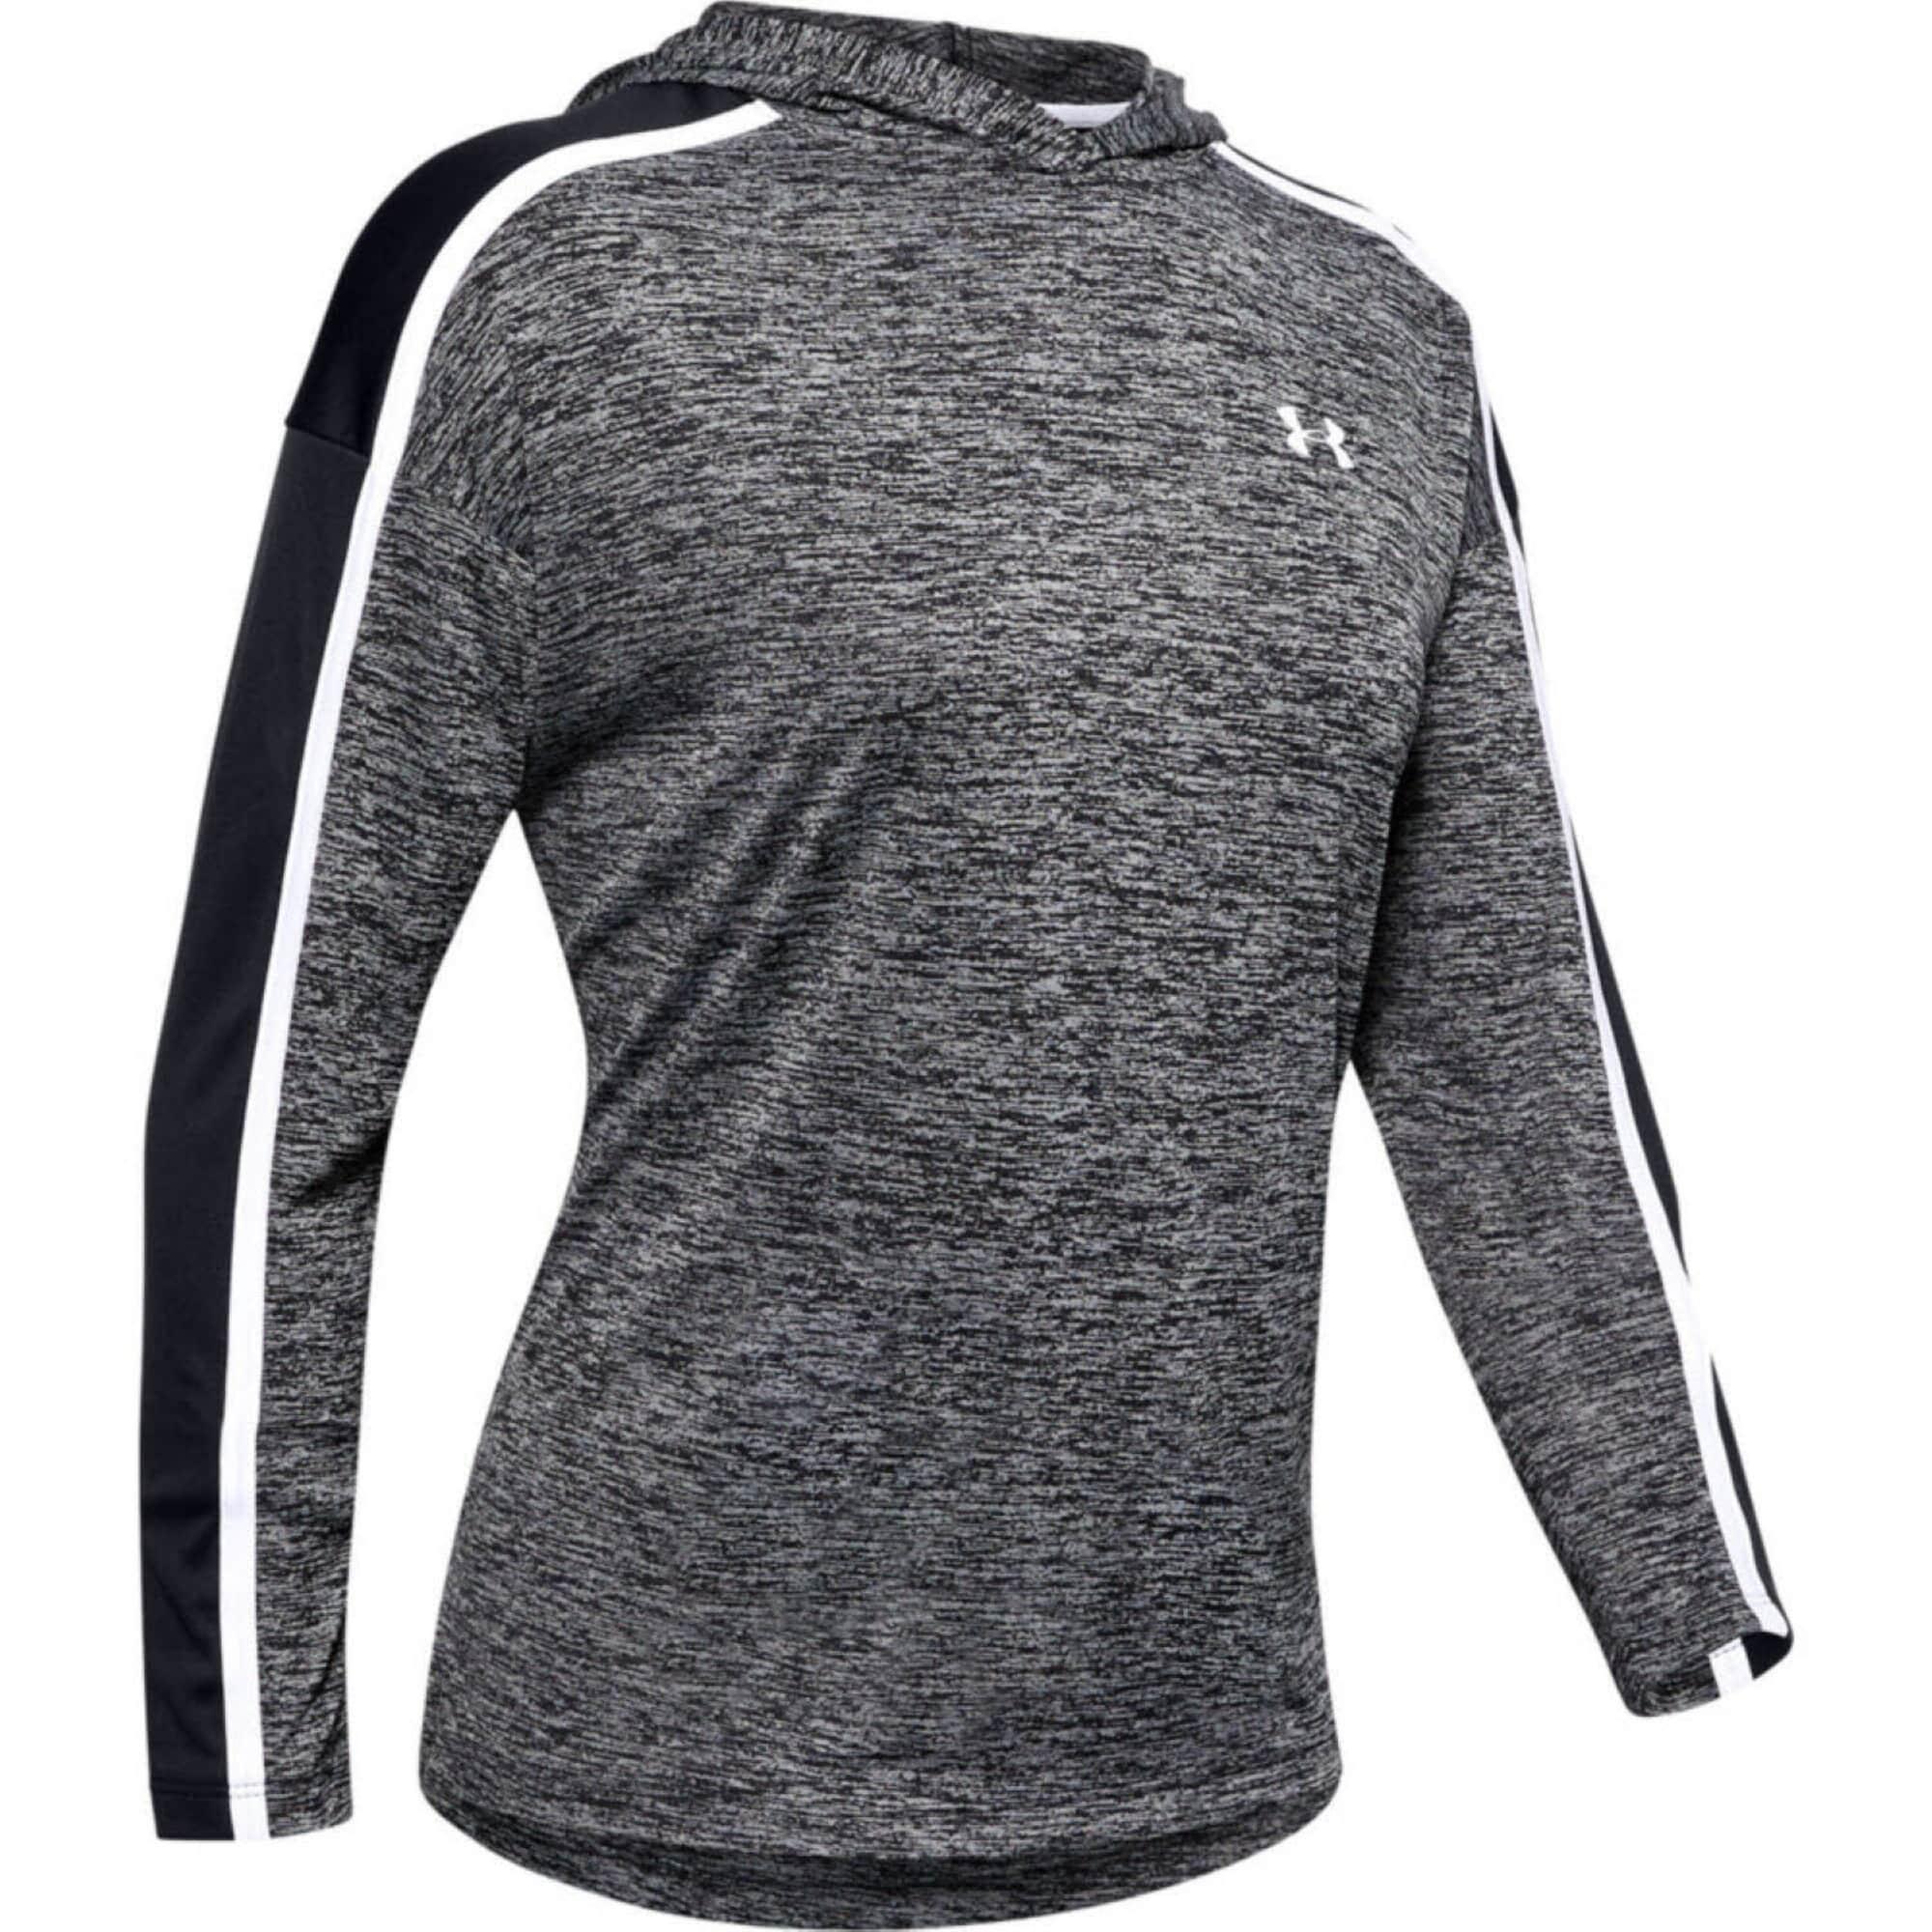 UNDER ARMOUR Sportinio tipo megztinis juoda / margai pilka / balta